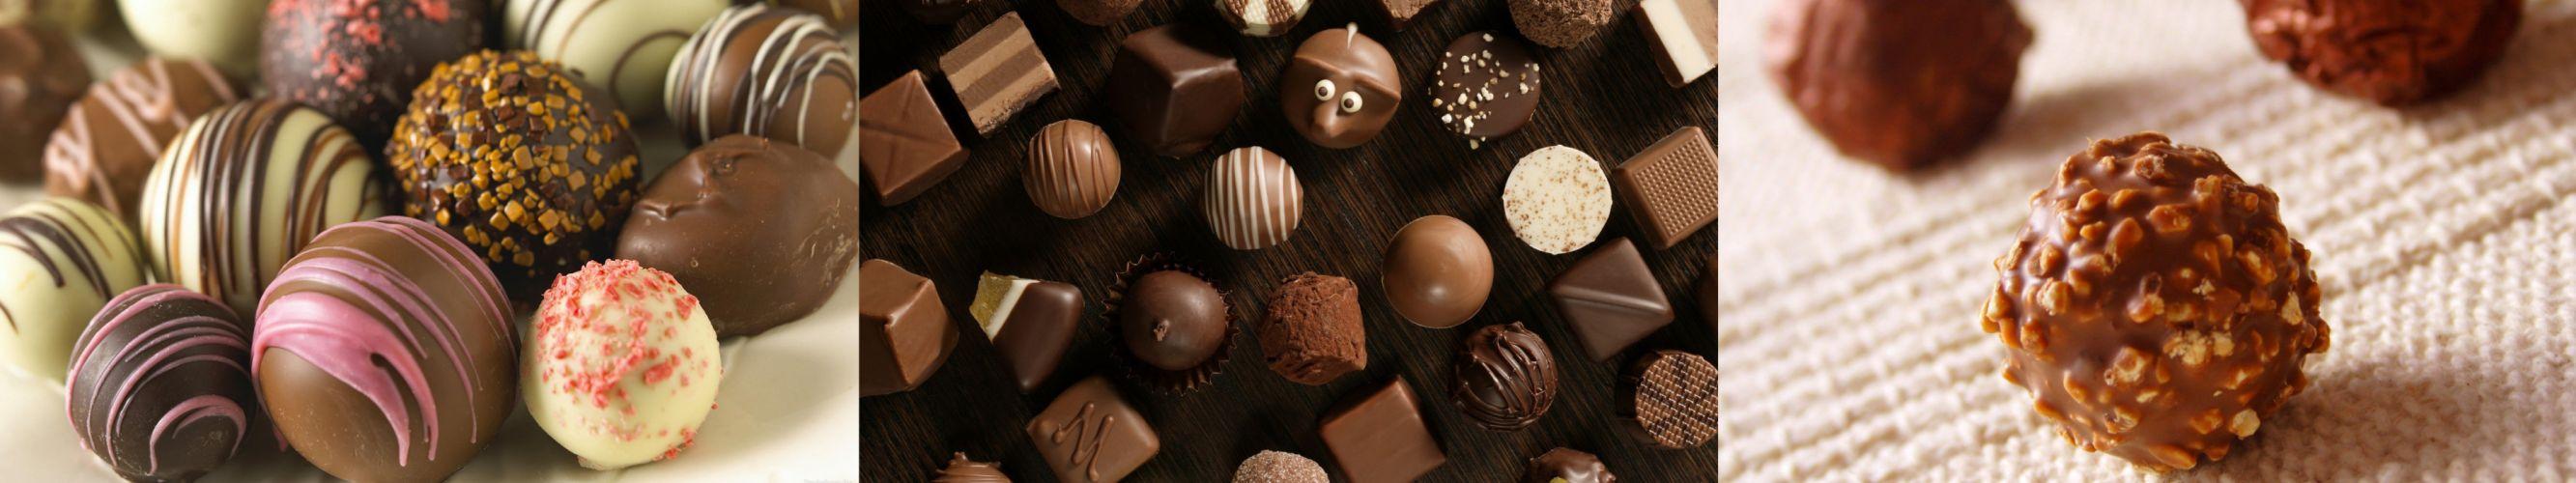 triple screen - multi monitor - multiple - chocolat chocolate - food nourriture - dessert - cake gateau - fruit wallpaper